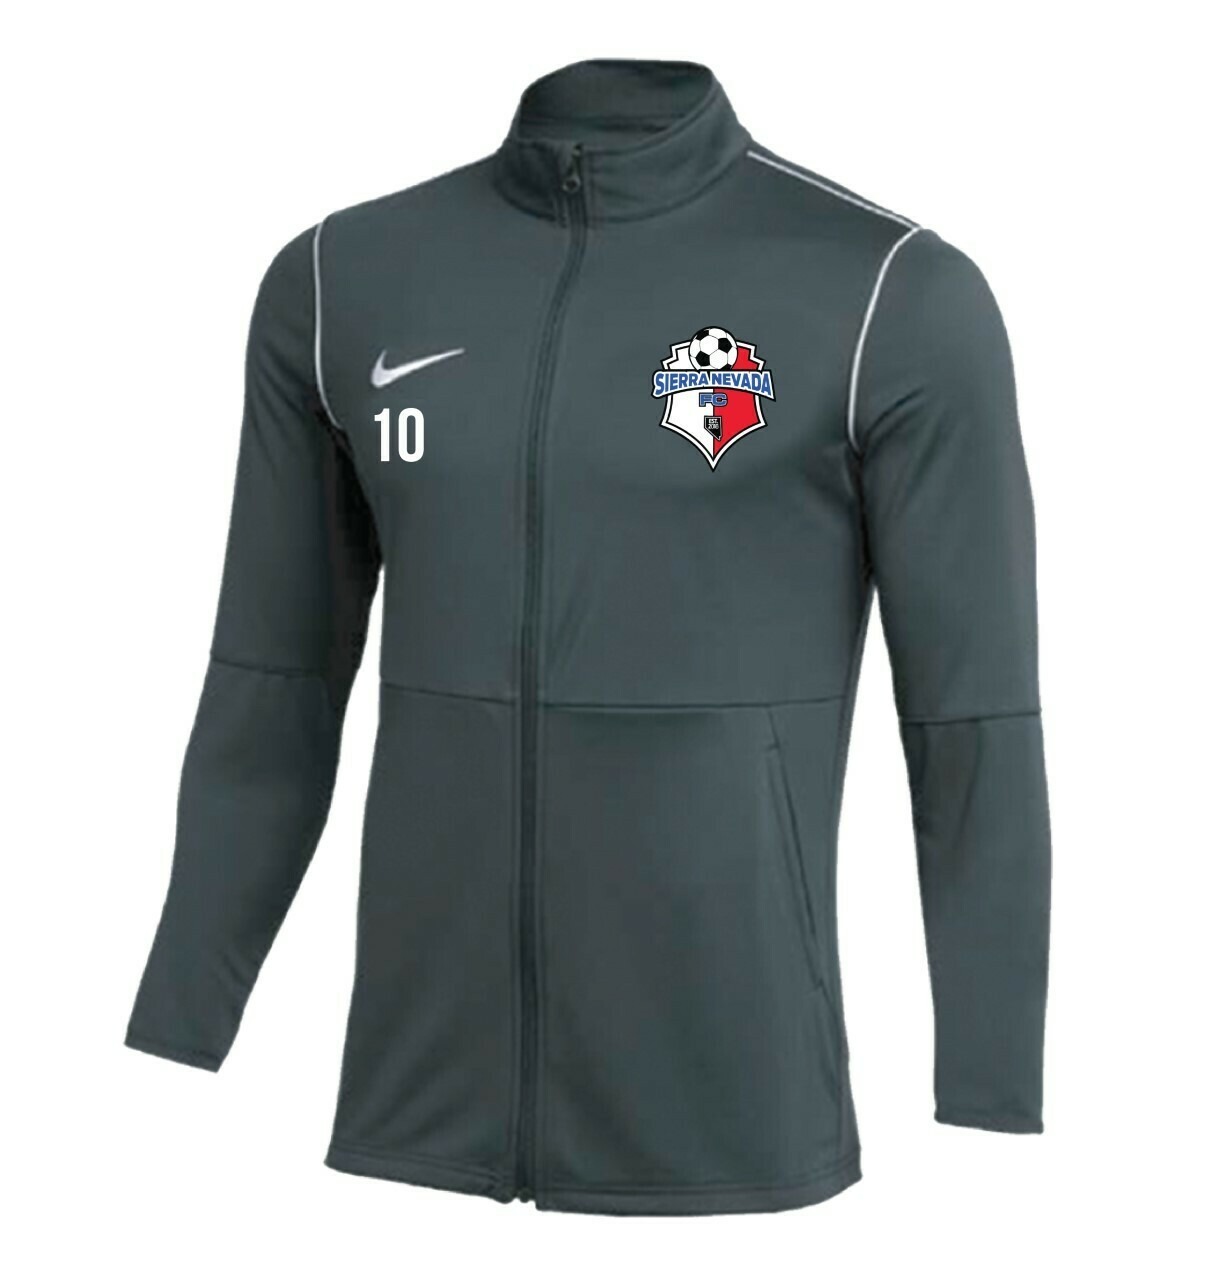 Sierra Nevada FC Club Jacket with number